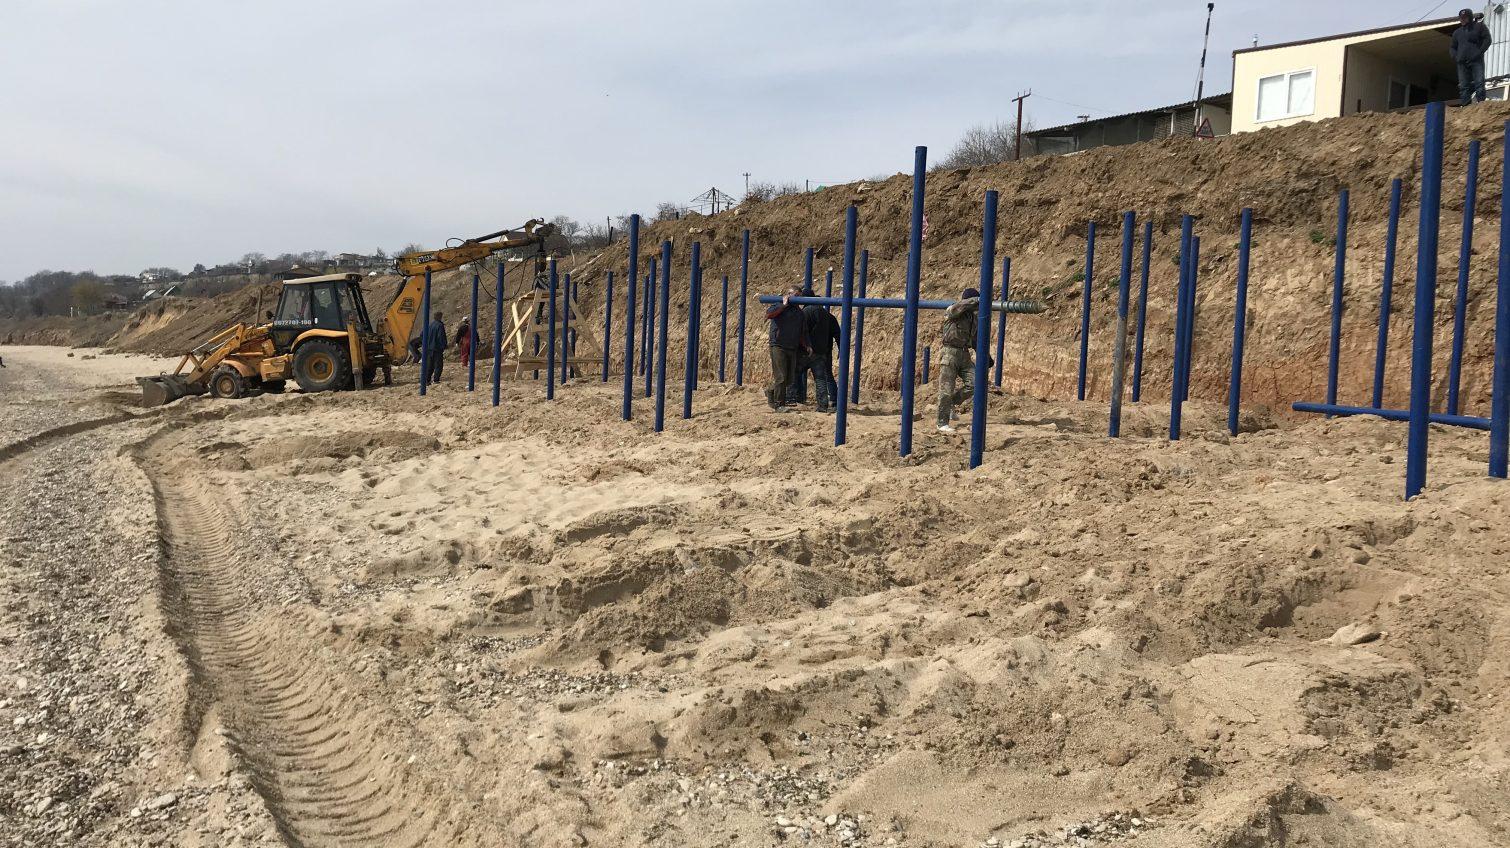 Пляж за 411-й батареей начали освобождать от незаконной застройки (фото, видео) «фото»